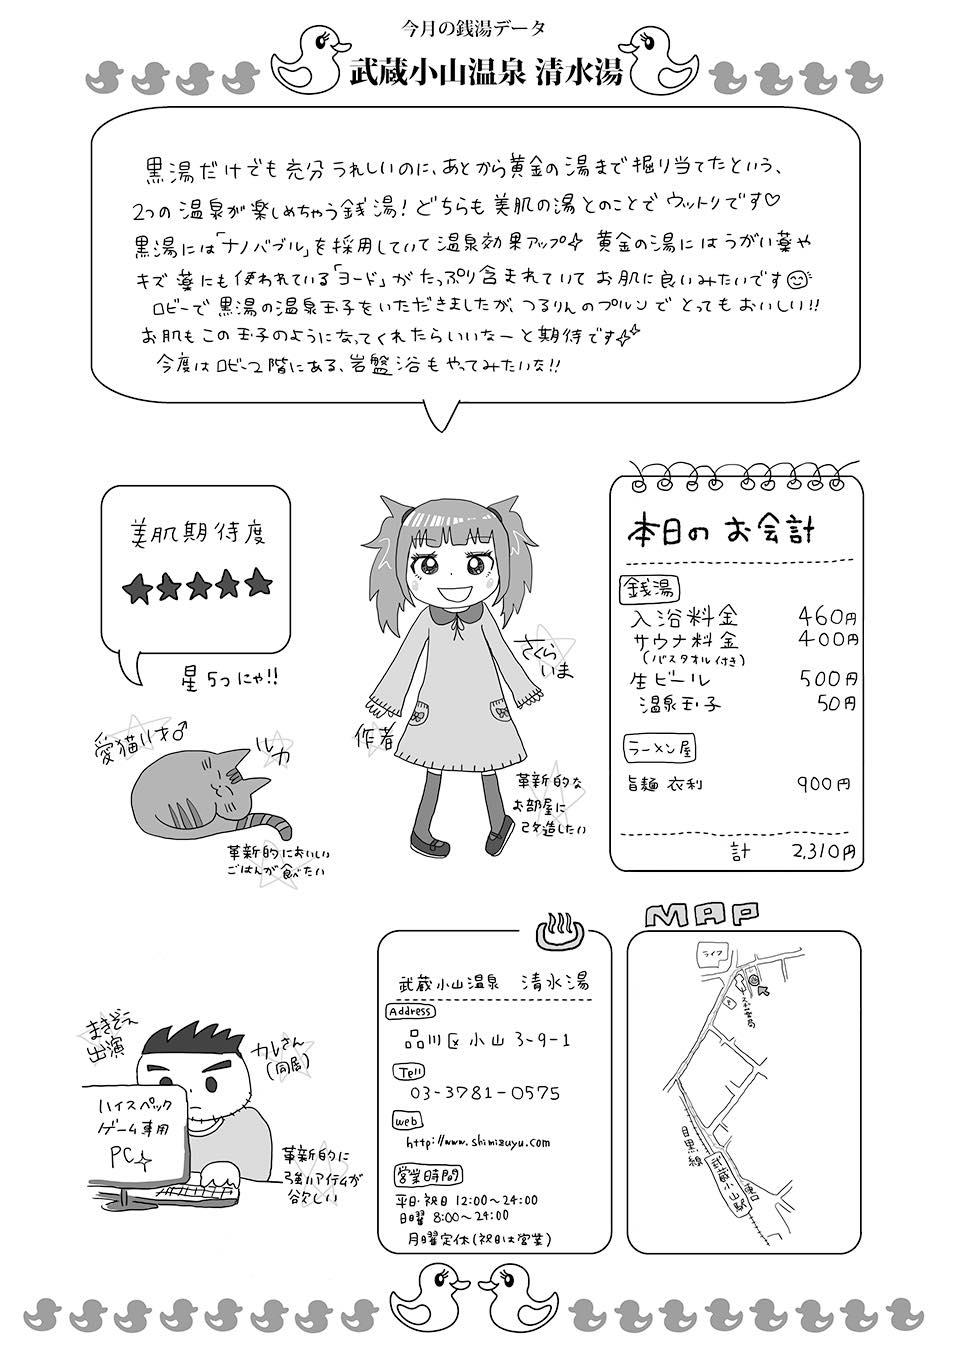 th武蔵小山温泉清水湯09